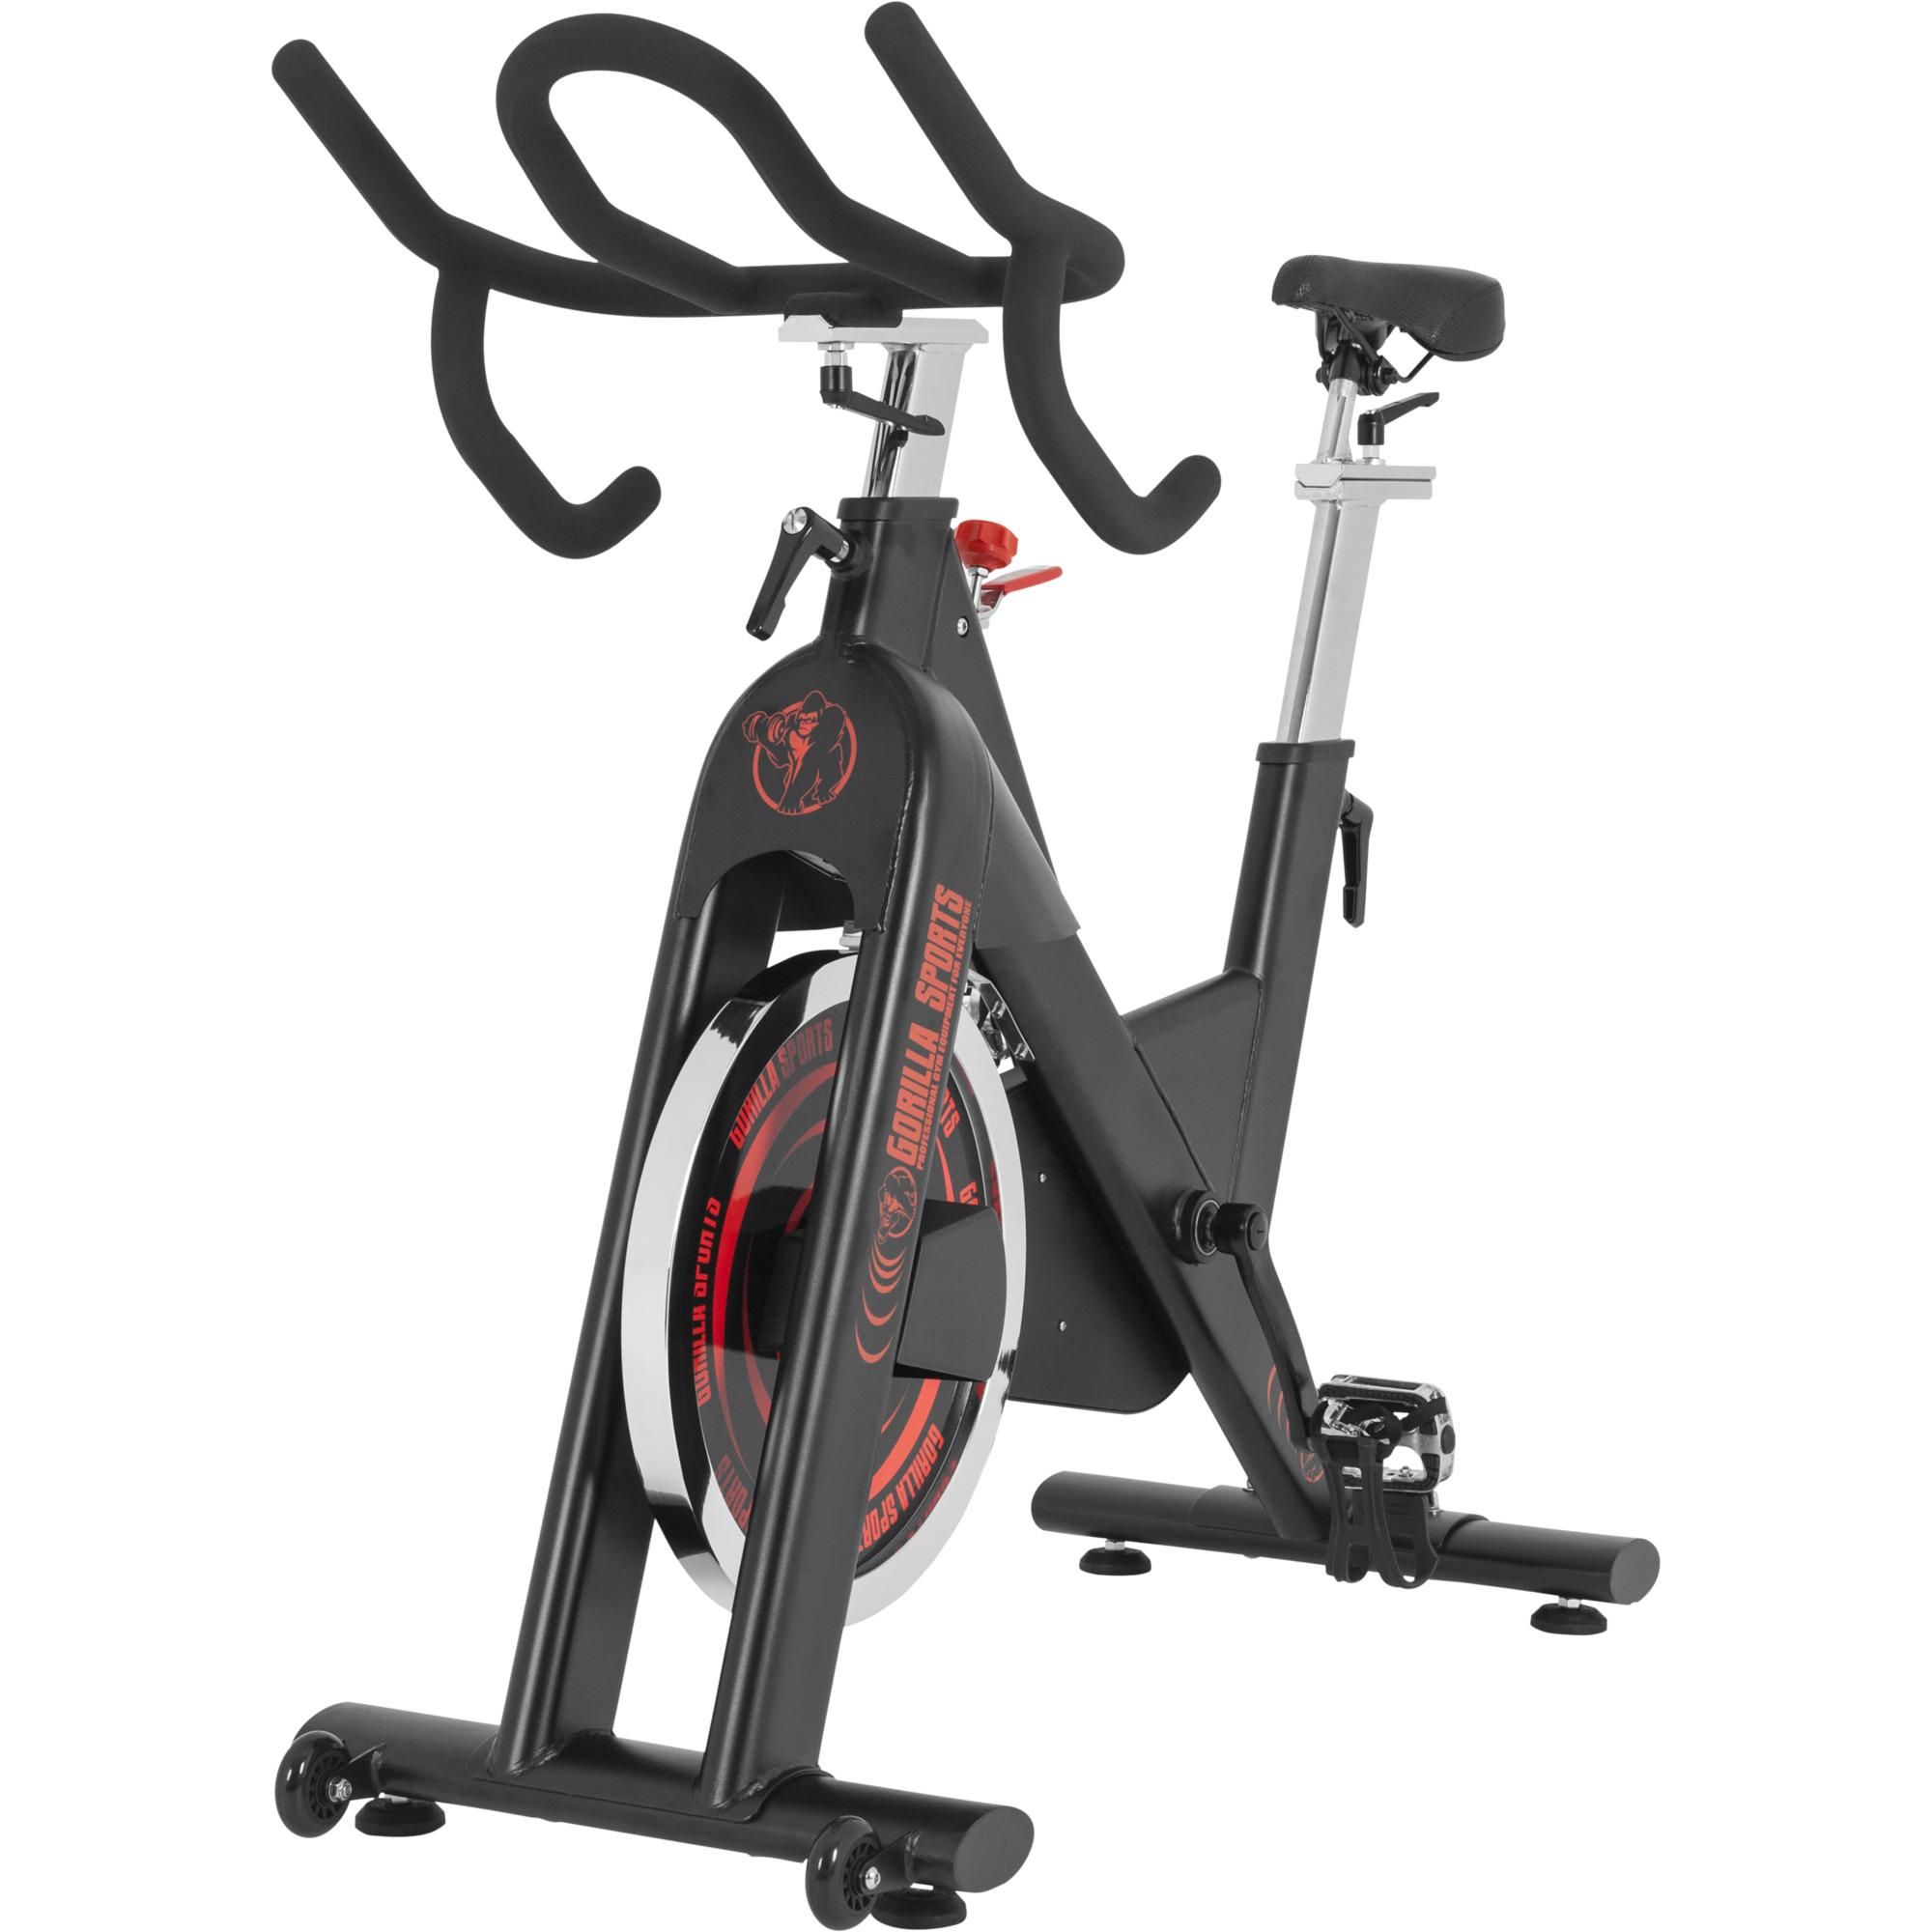 Gorilla Sports Indoor Cycling mit Tretlager F50x100 100619-00049-0001